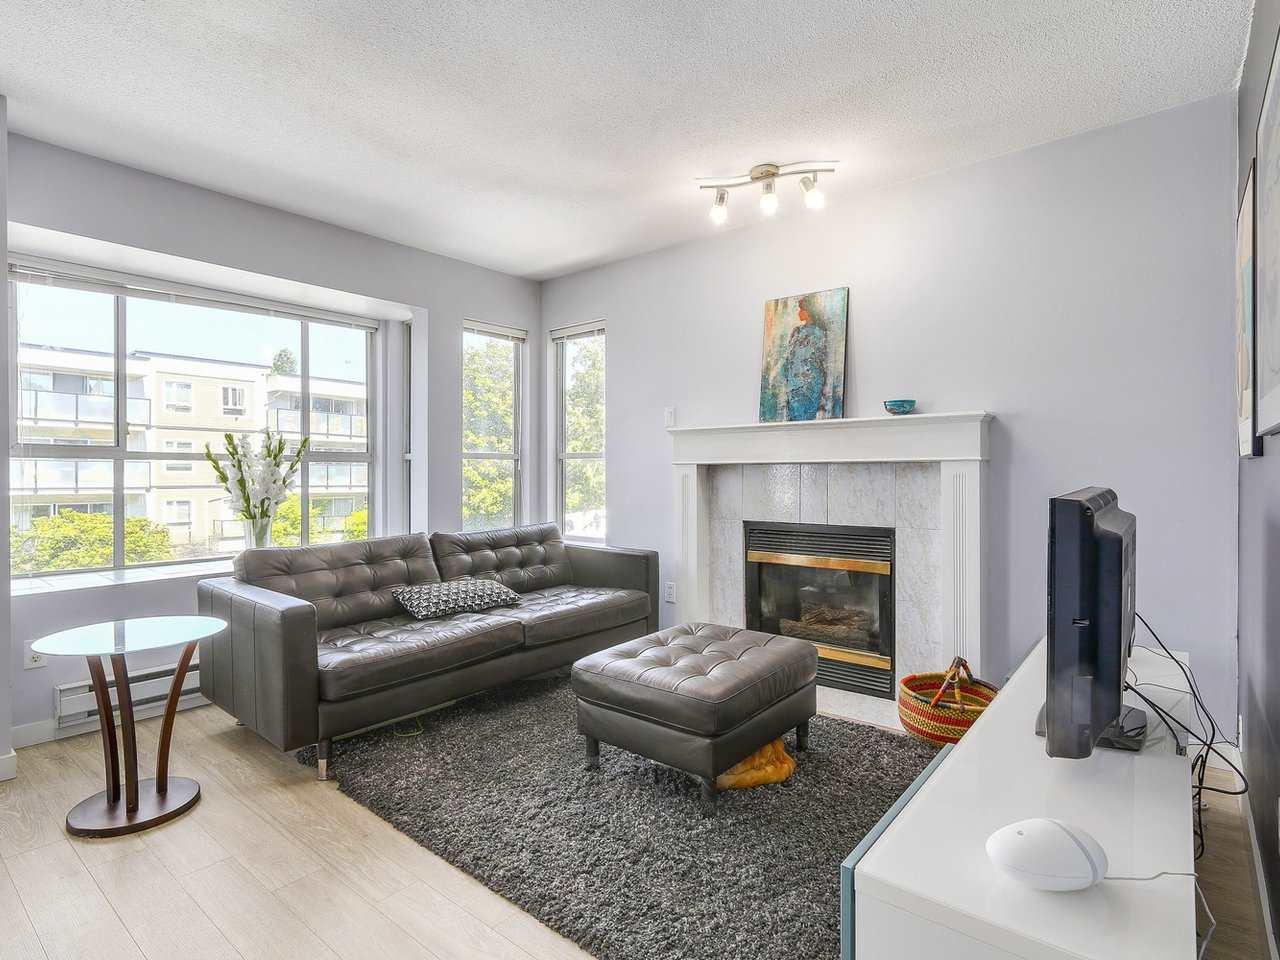 Condo Apartment at 301 120 GARDEN DRIVE, Unit 301, Vancouver East, British Columbia. Image 1